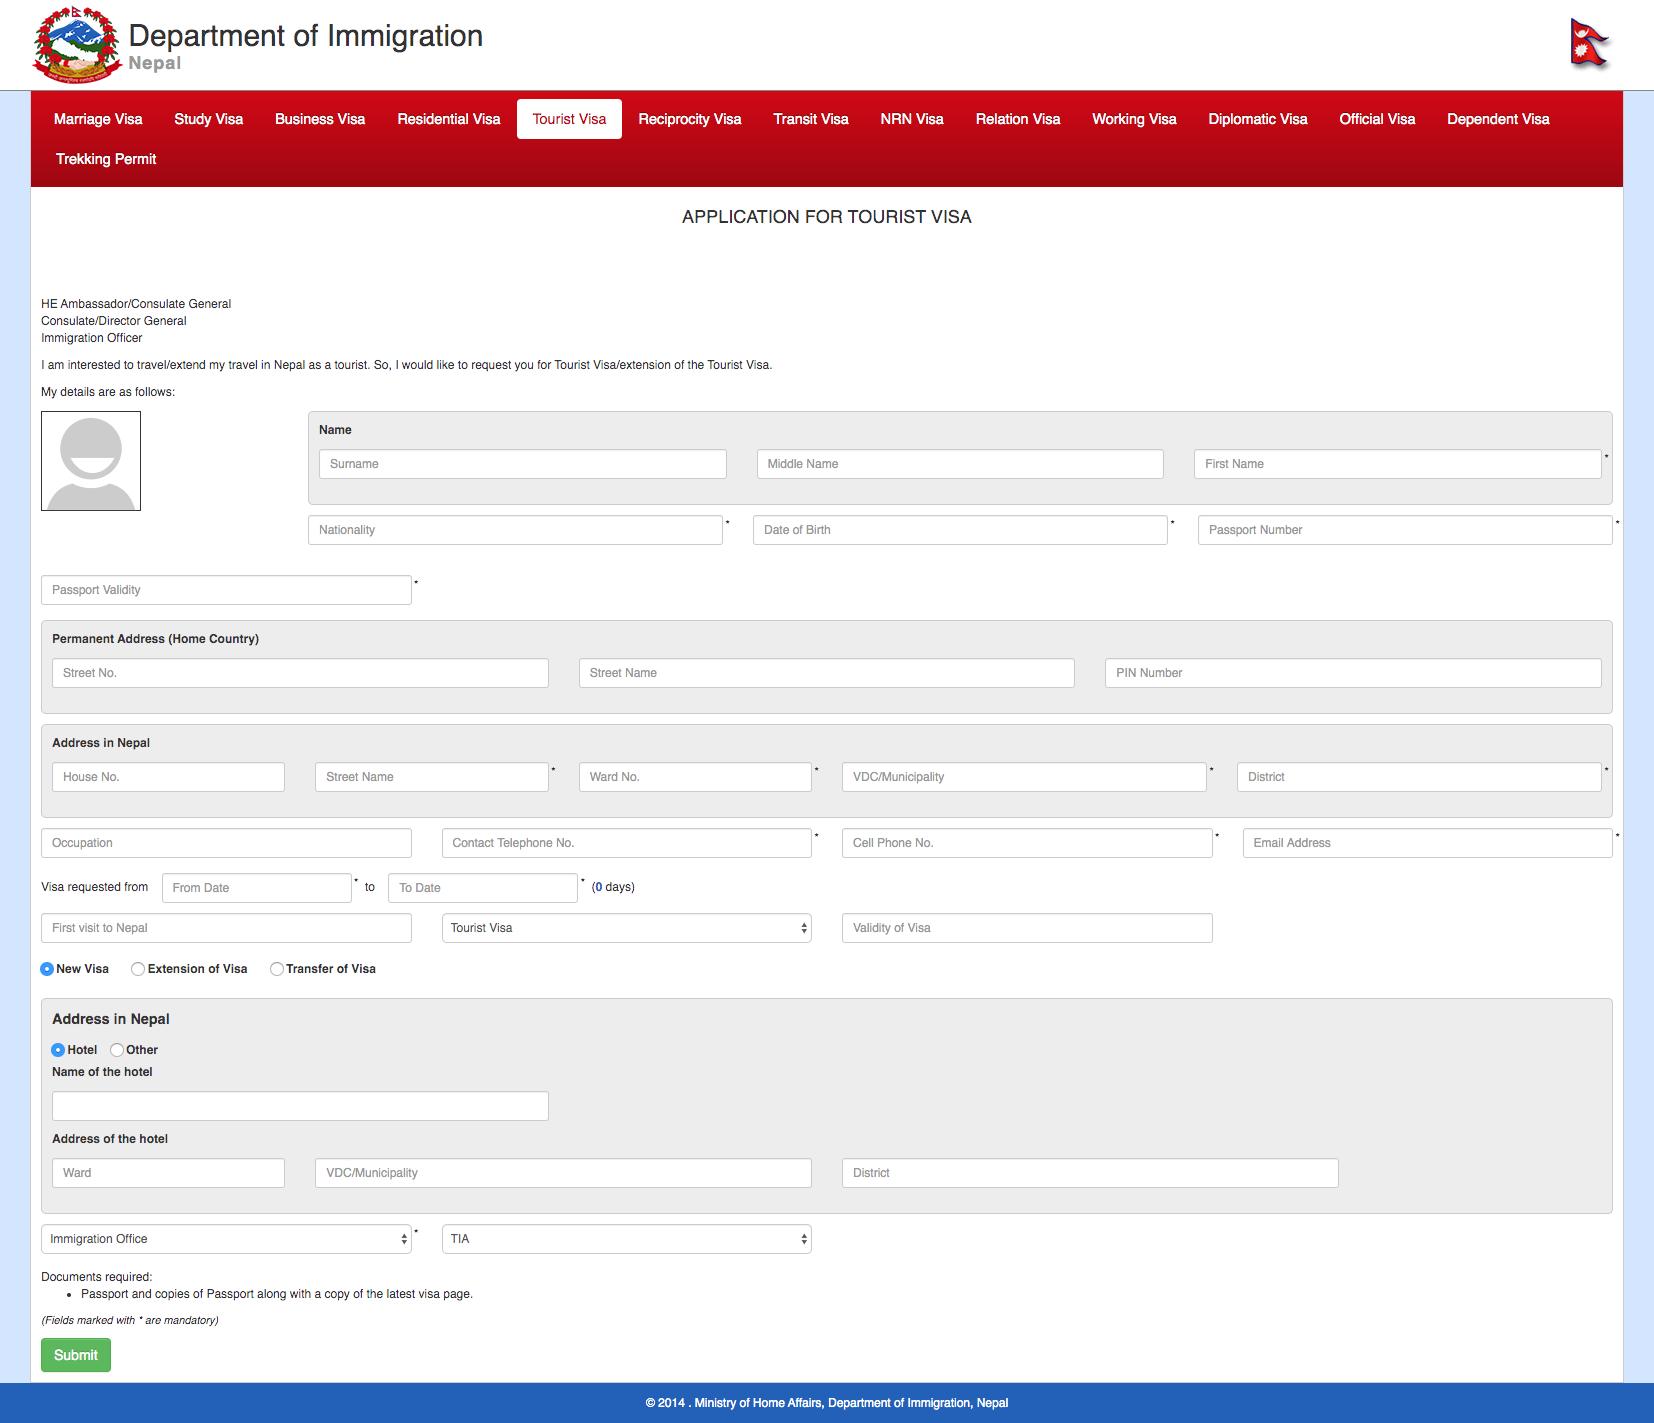 Nepal Visa Online Application Form